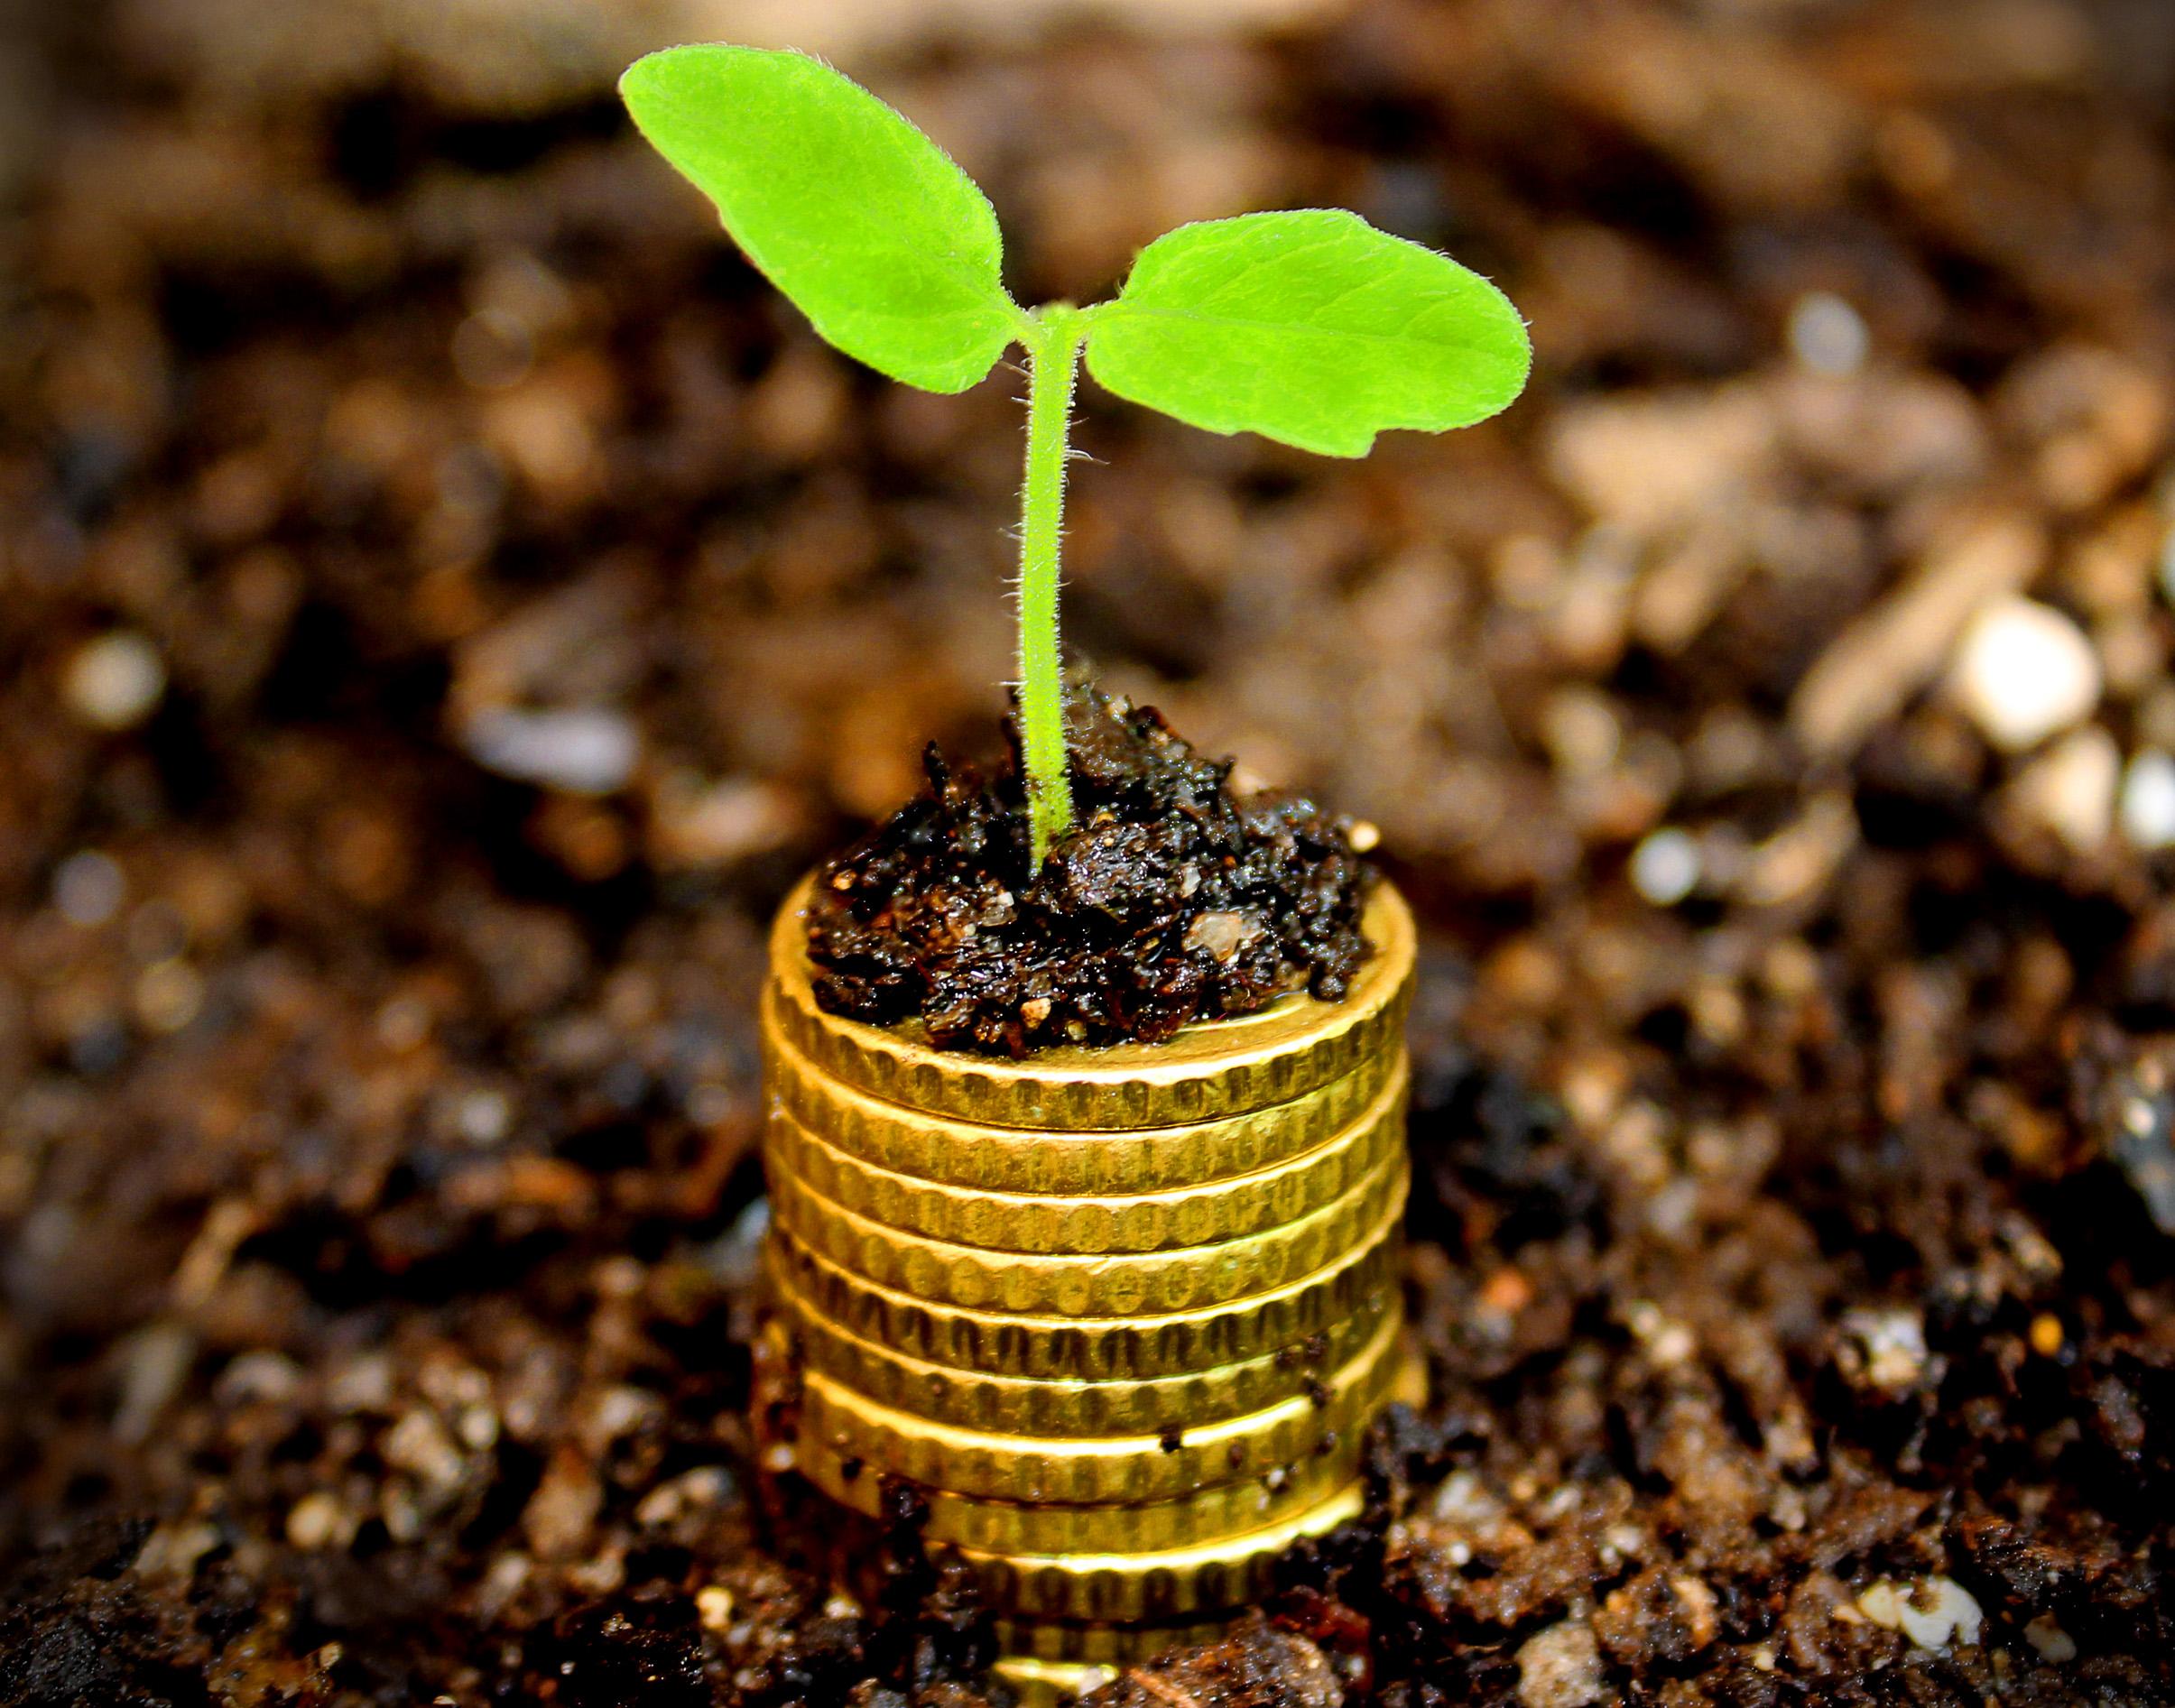 Money growth concept - Coins in the soil, Account, Money, Platform, Plant, HQ Photo